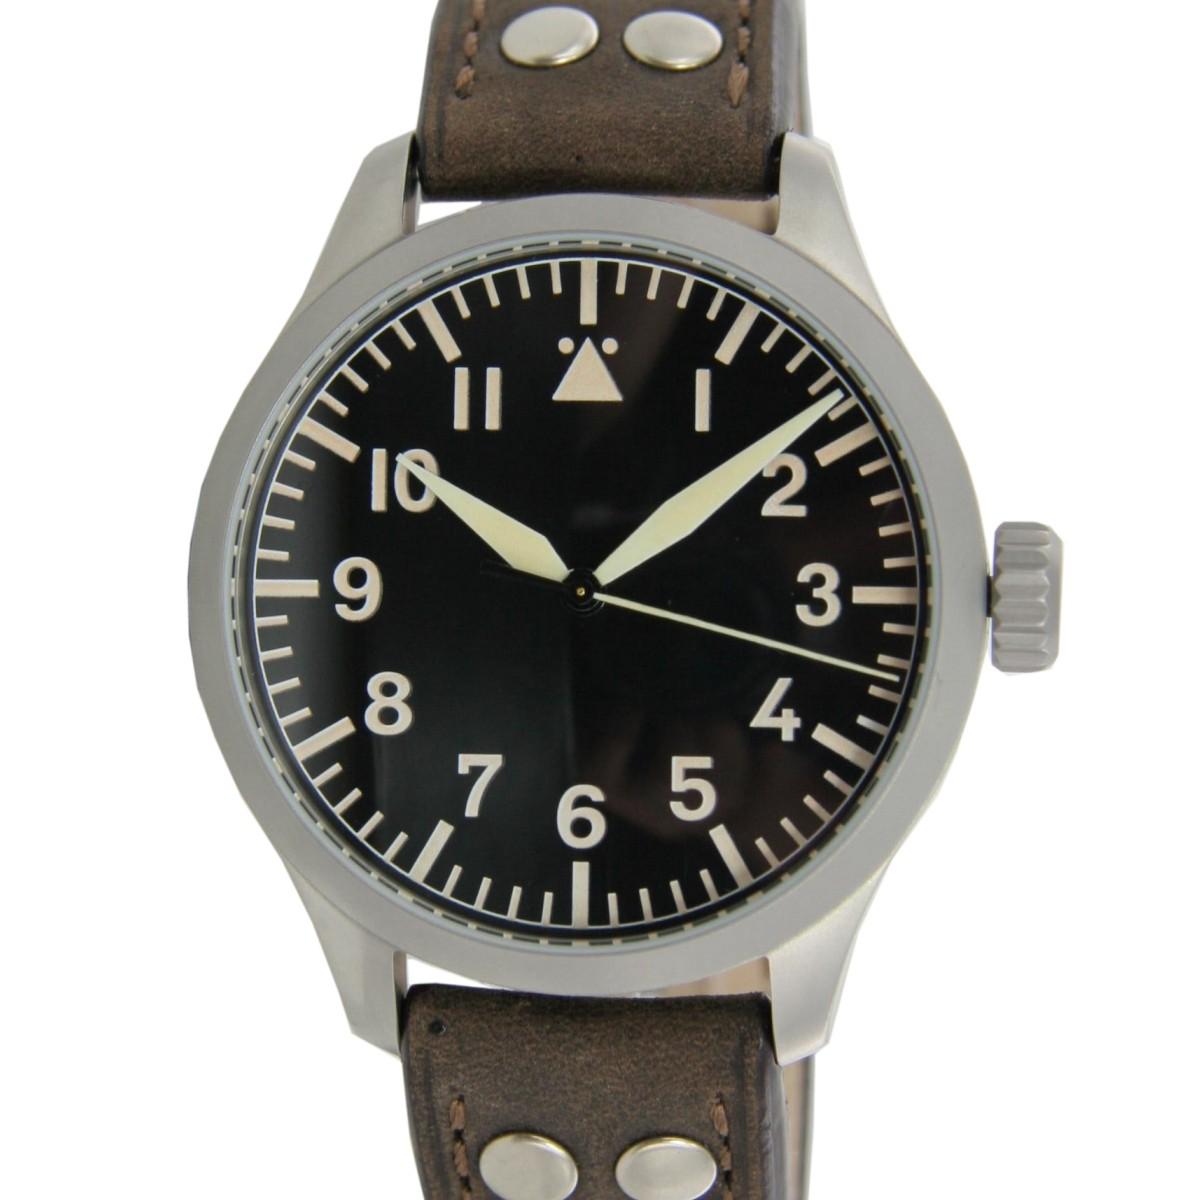 Automatik Beobachter 3h143a Aristo Armbanduhr Edelstahl Herren Uhr dxQeWrCBo